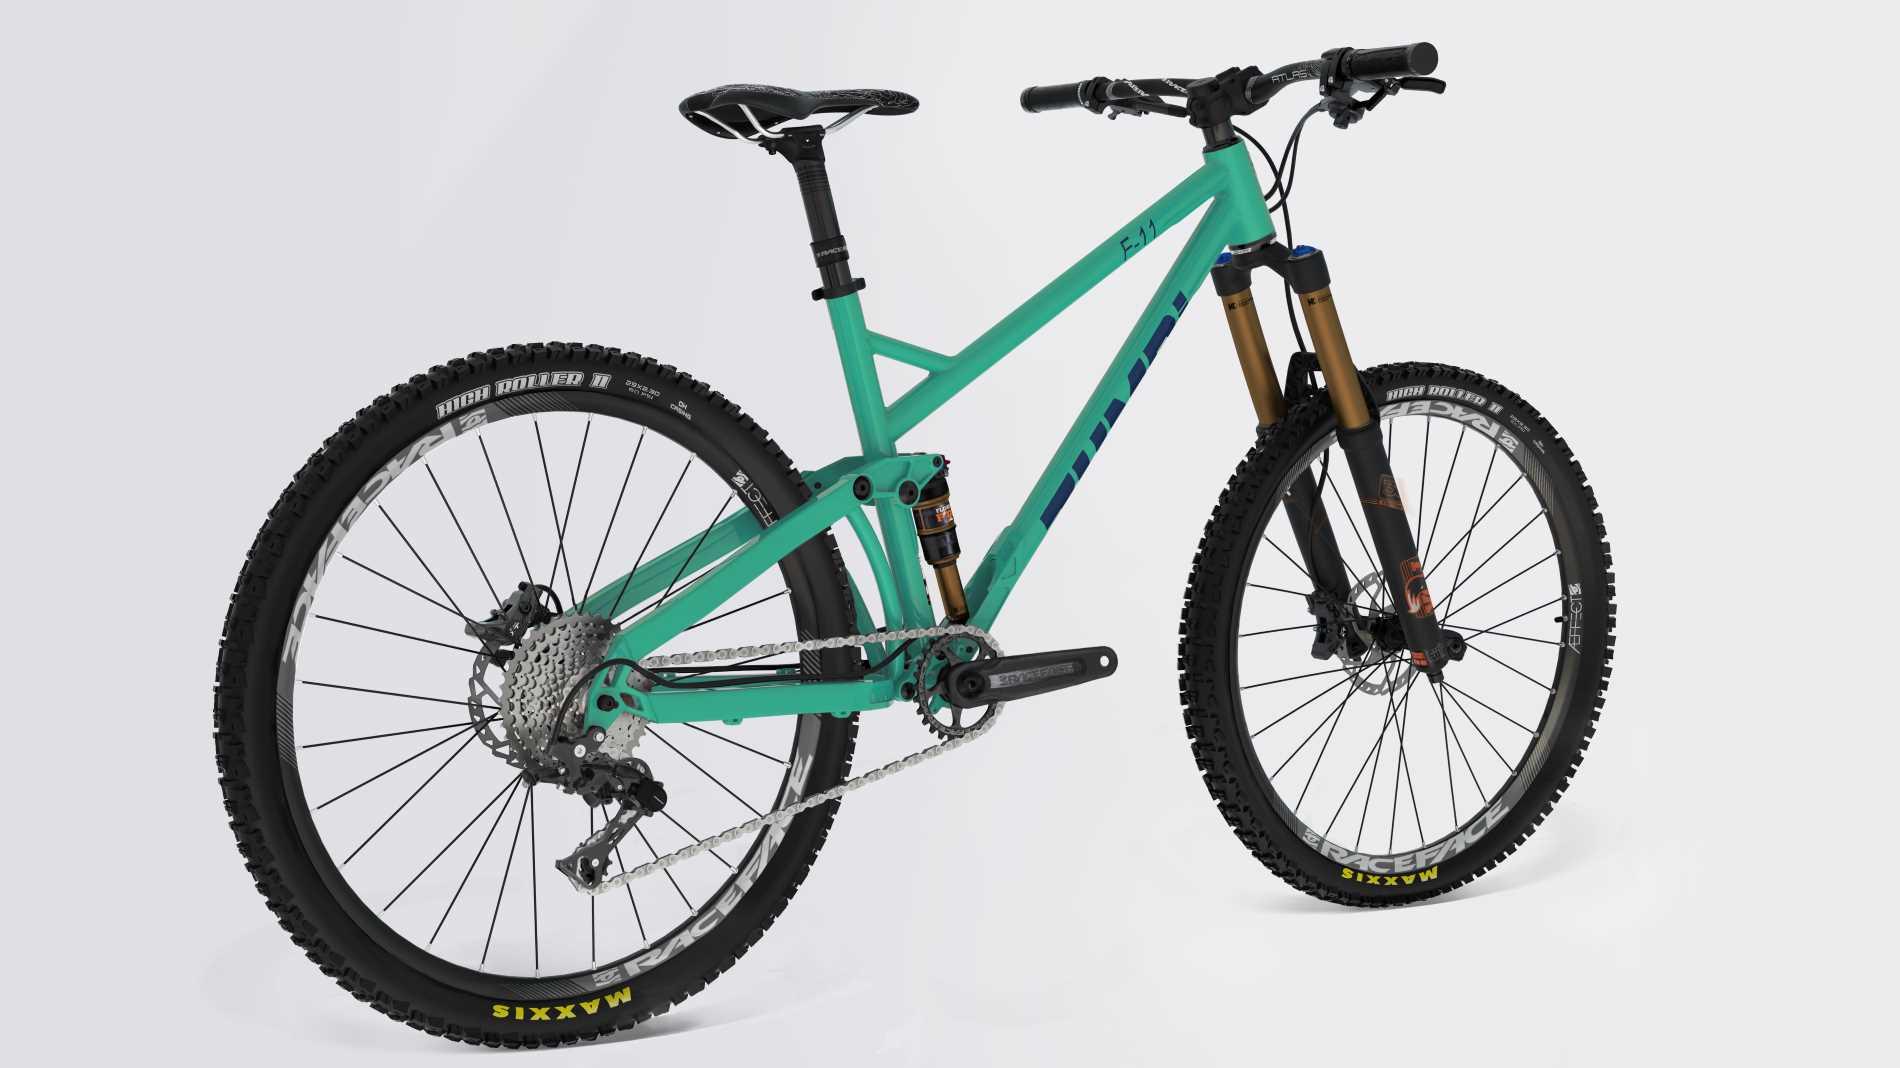 damski rower gorski 27.5 4